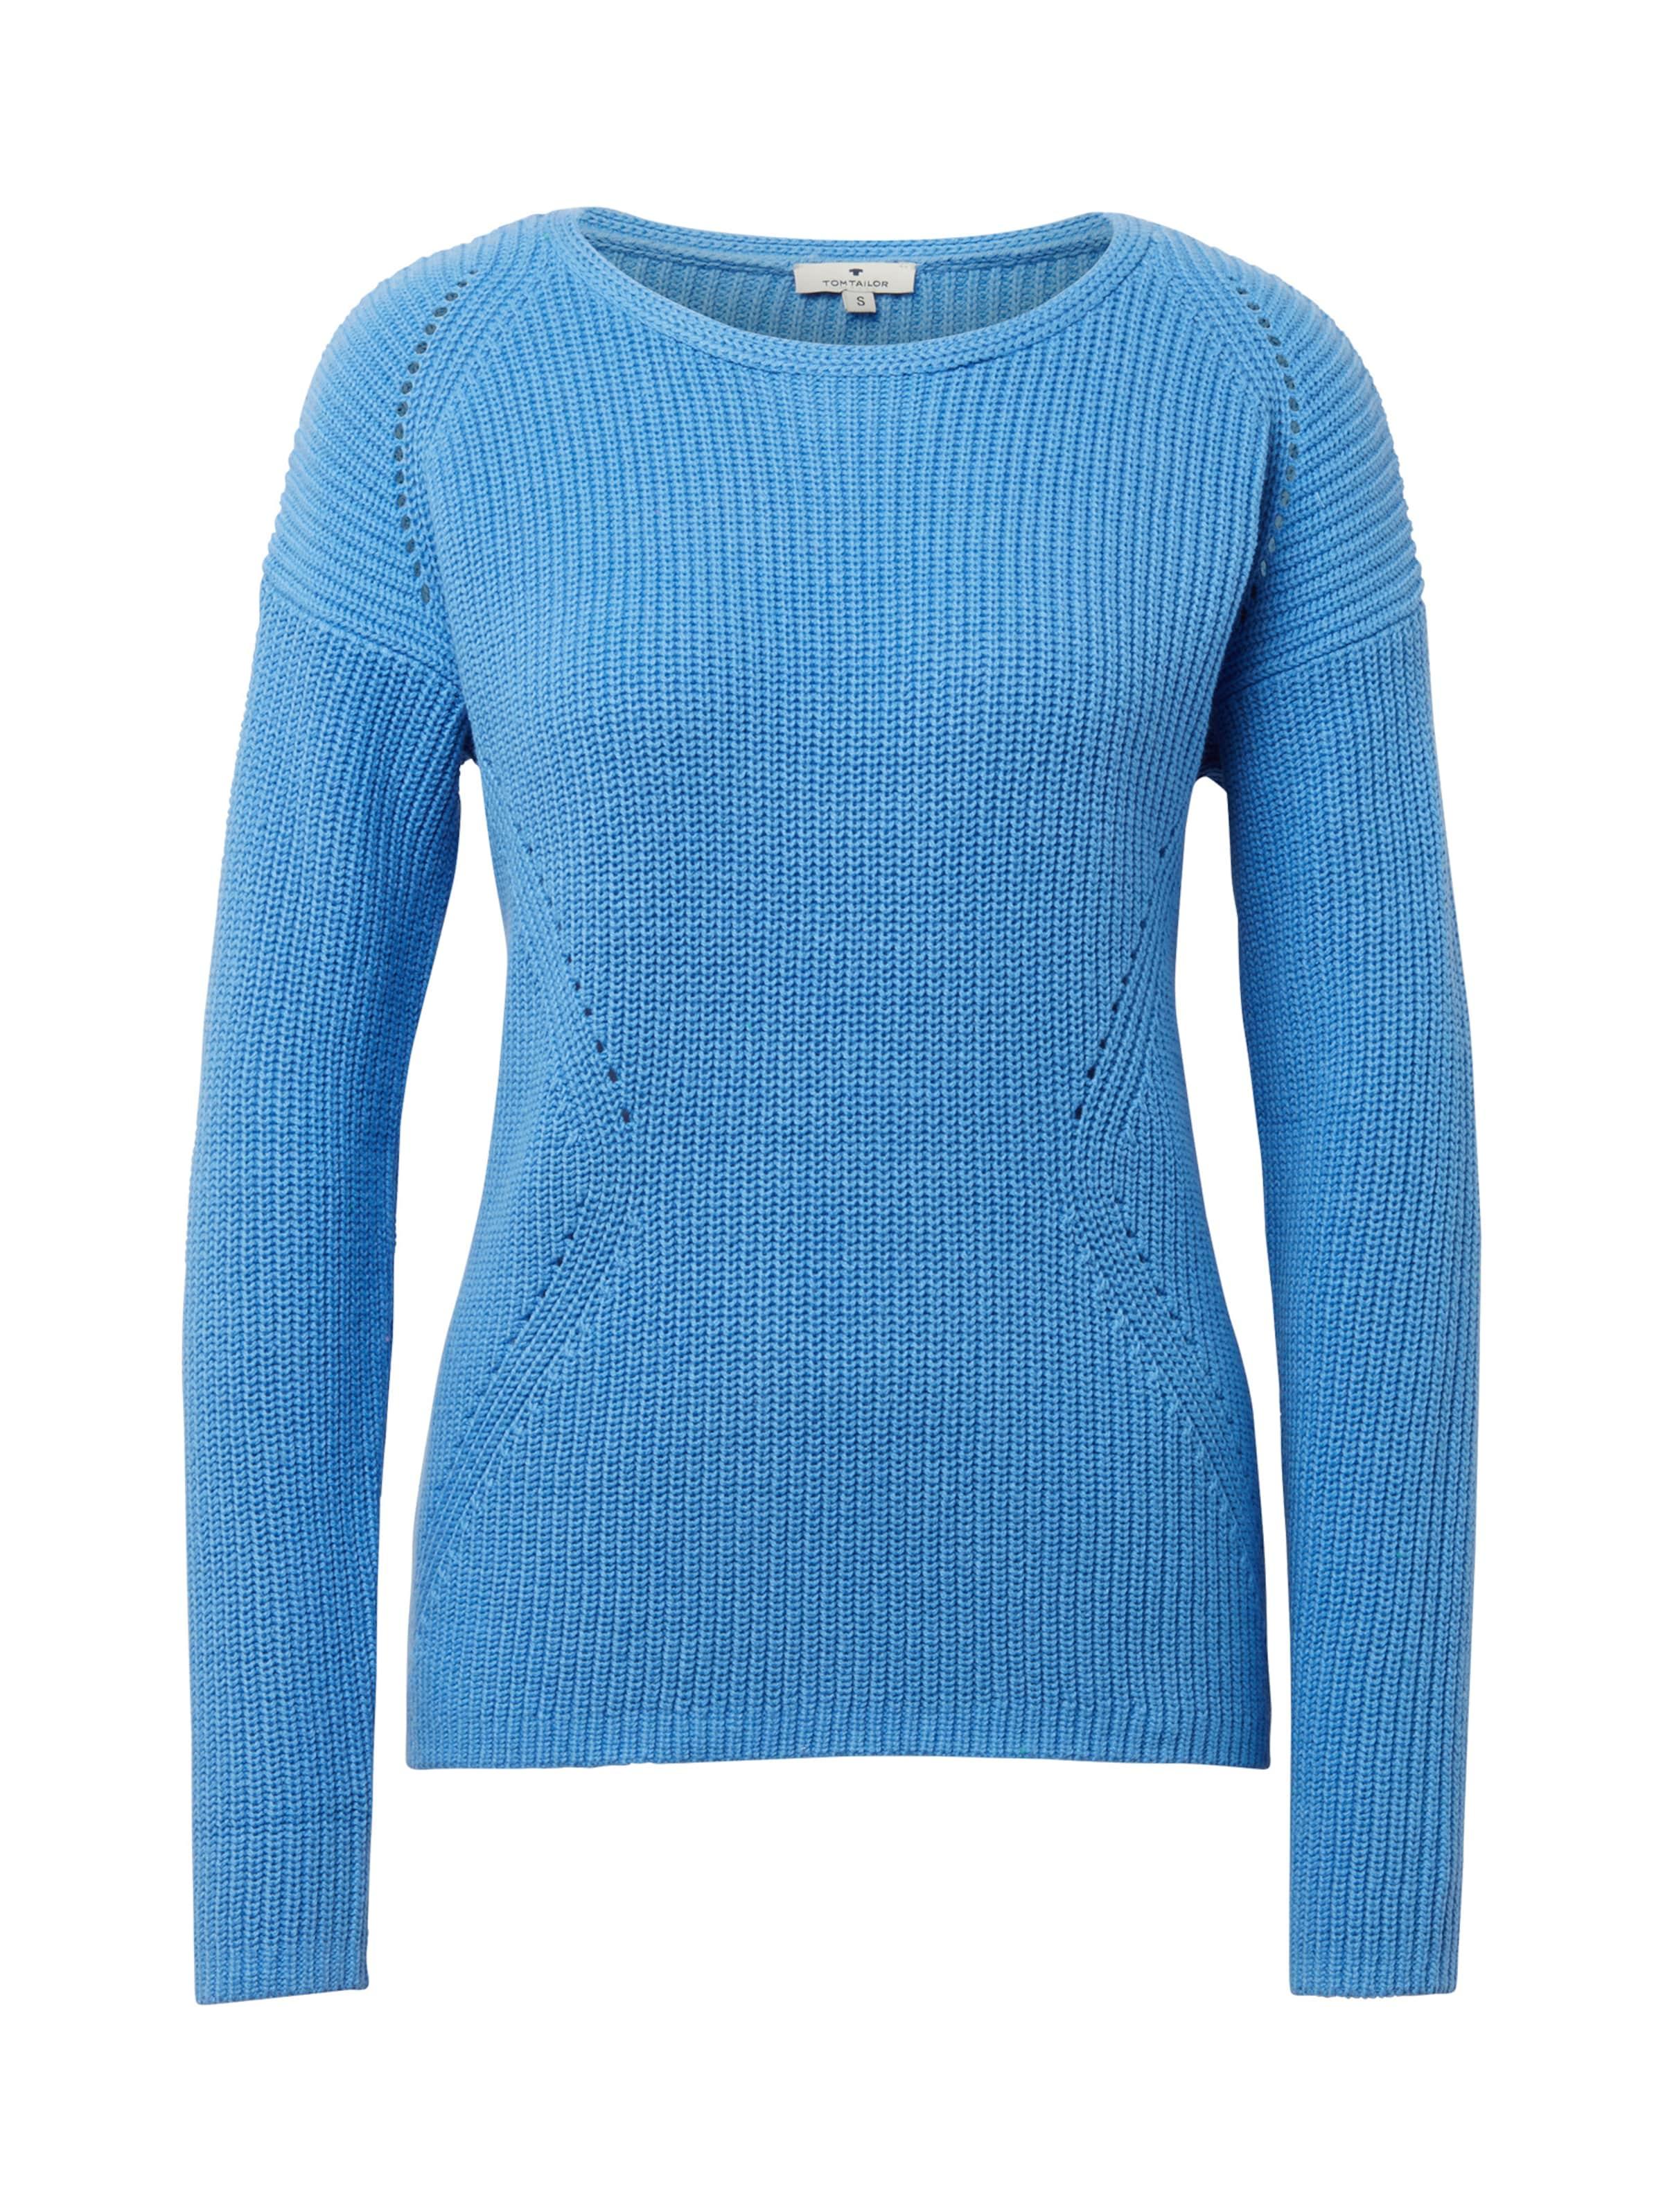 Pullover Pullover In Tom Tom In Hellblau Hellblau Tailor Tailor MqpzGSUV